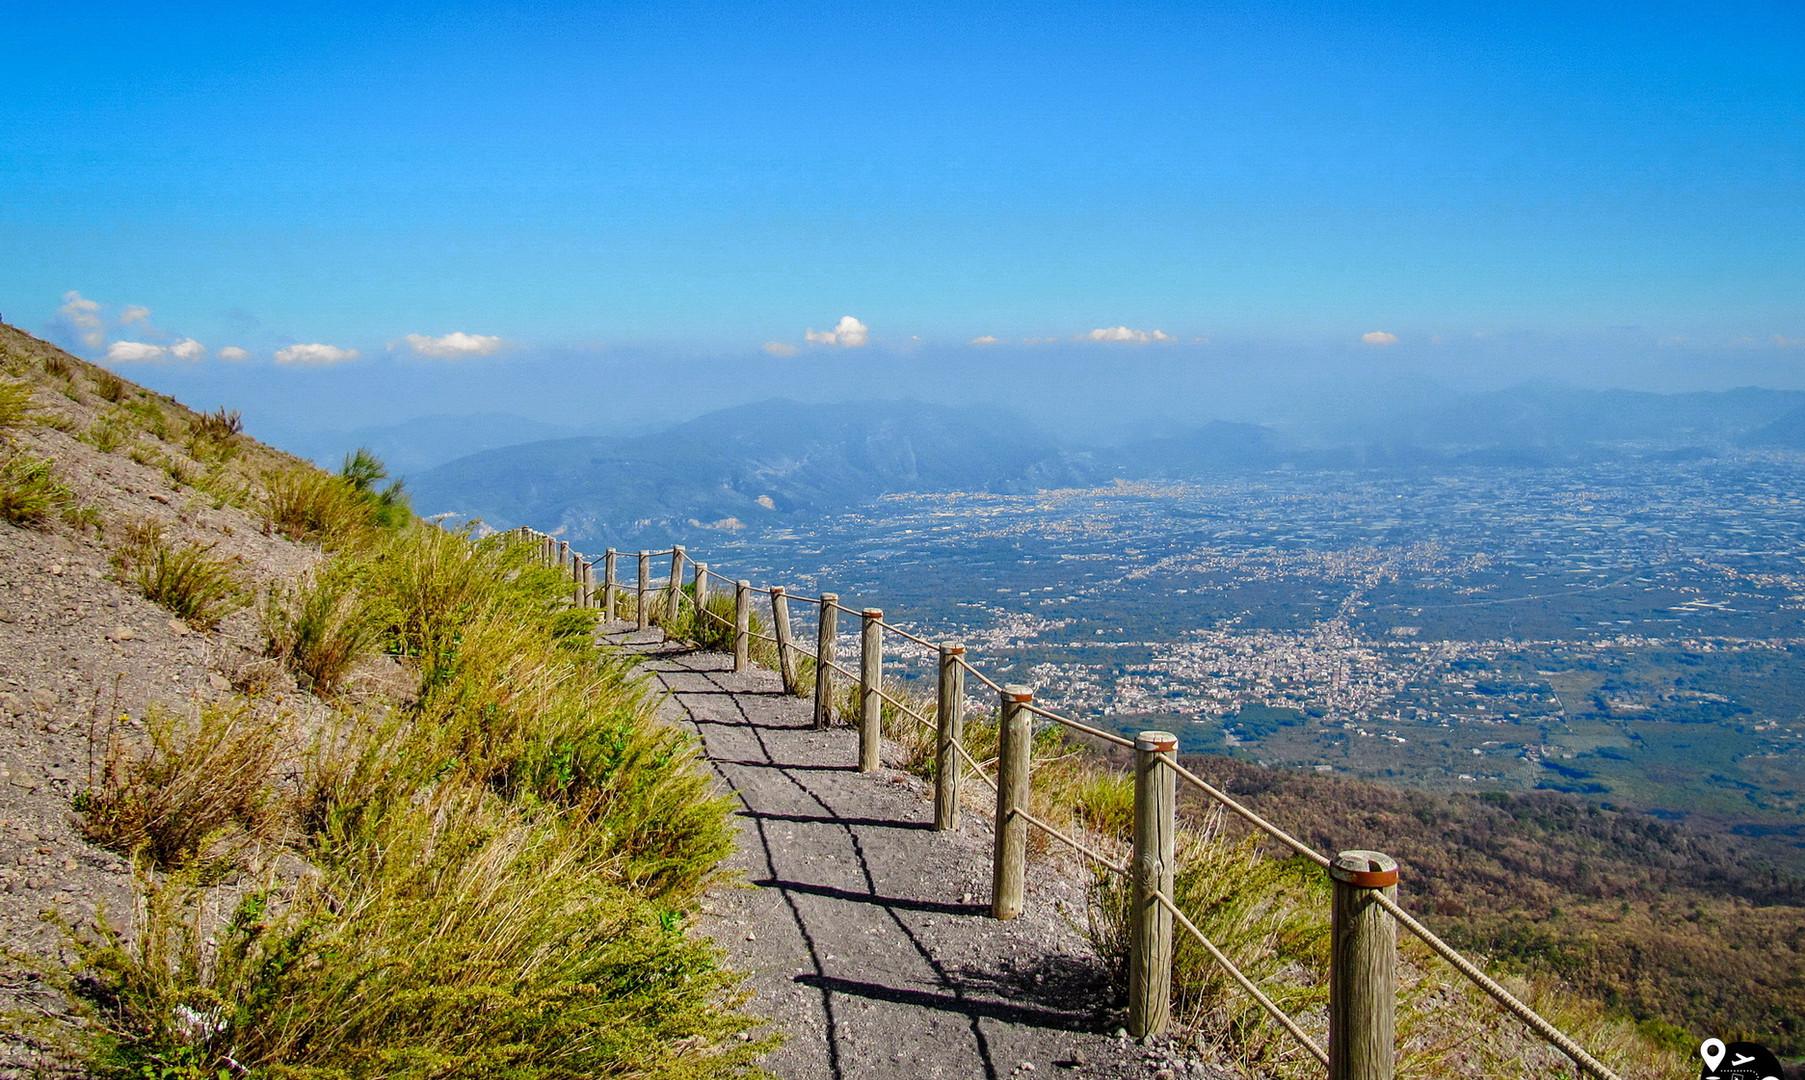 Тропа на вулкан Везувий